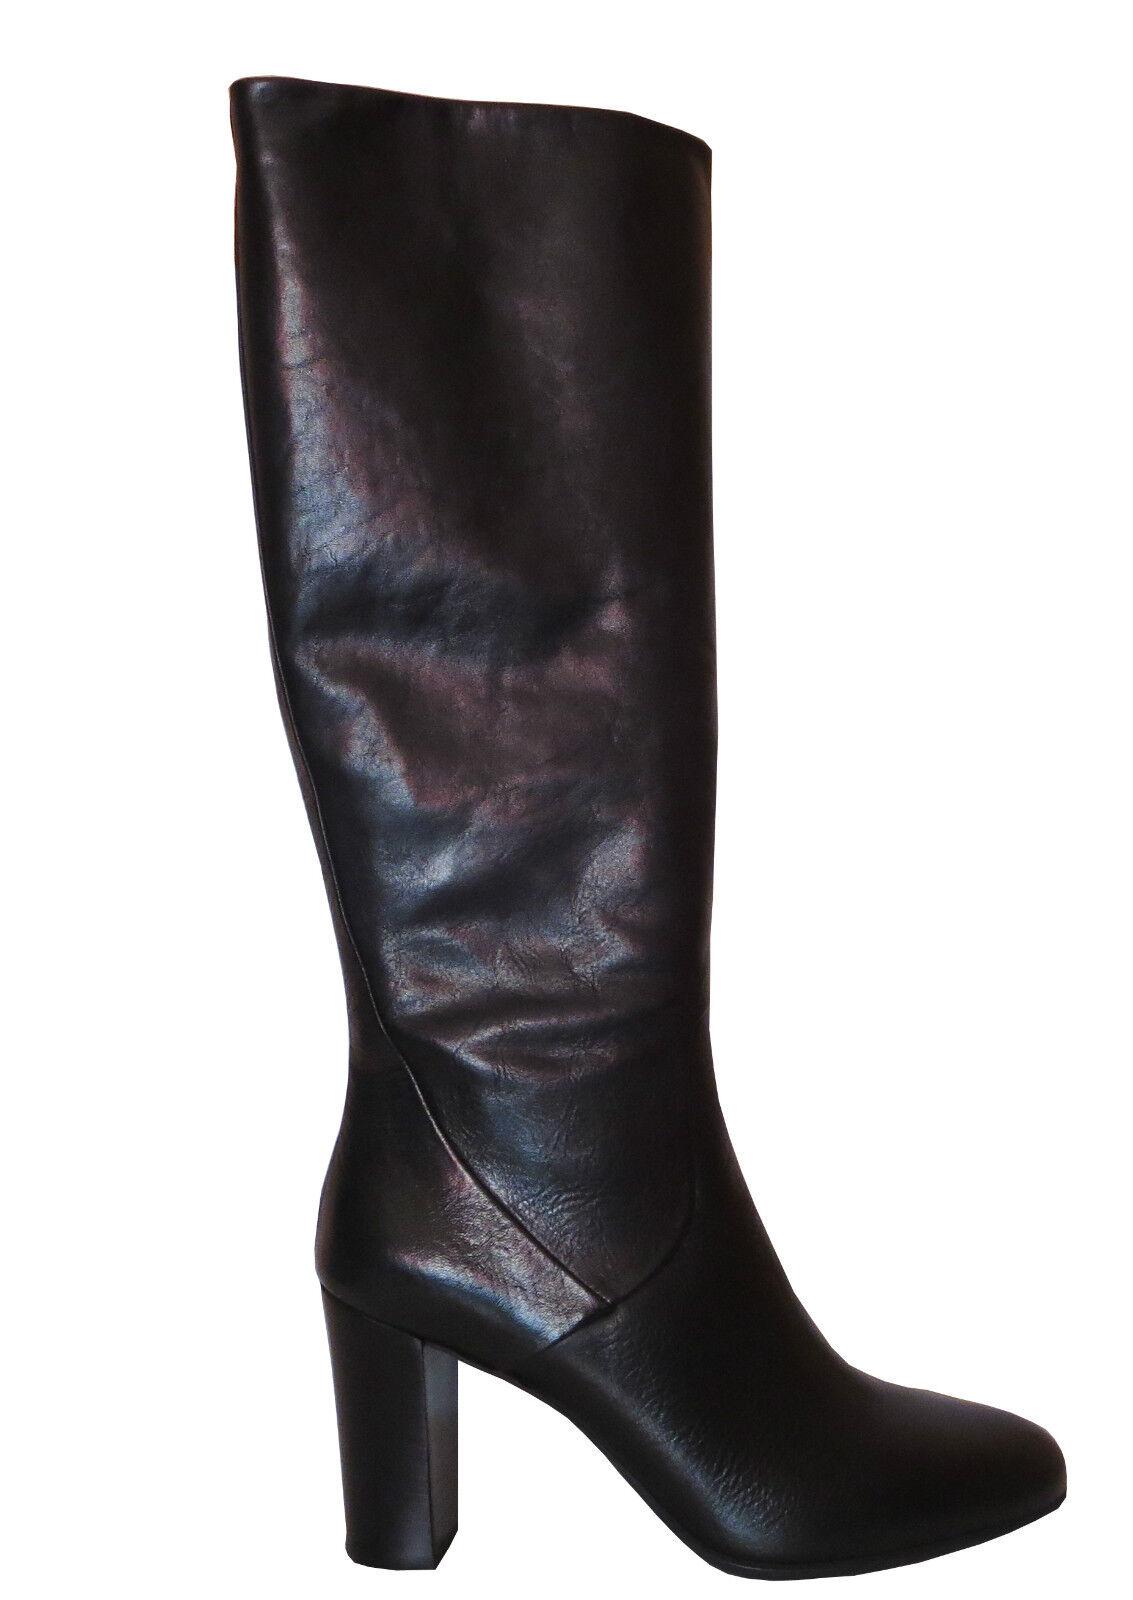 GANT ] Lucy [ ] GANT Mujer Piel caña larga botas negras NUEVO 65d053